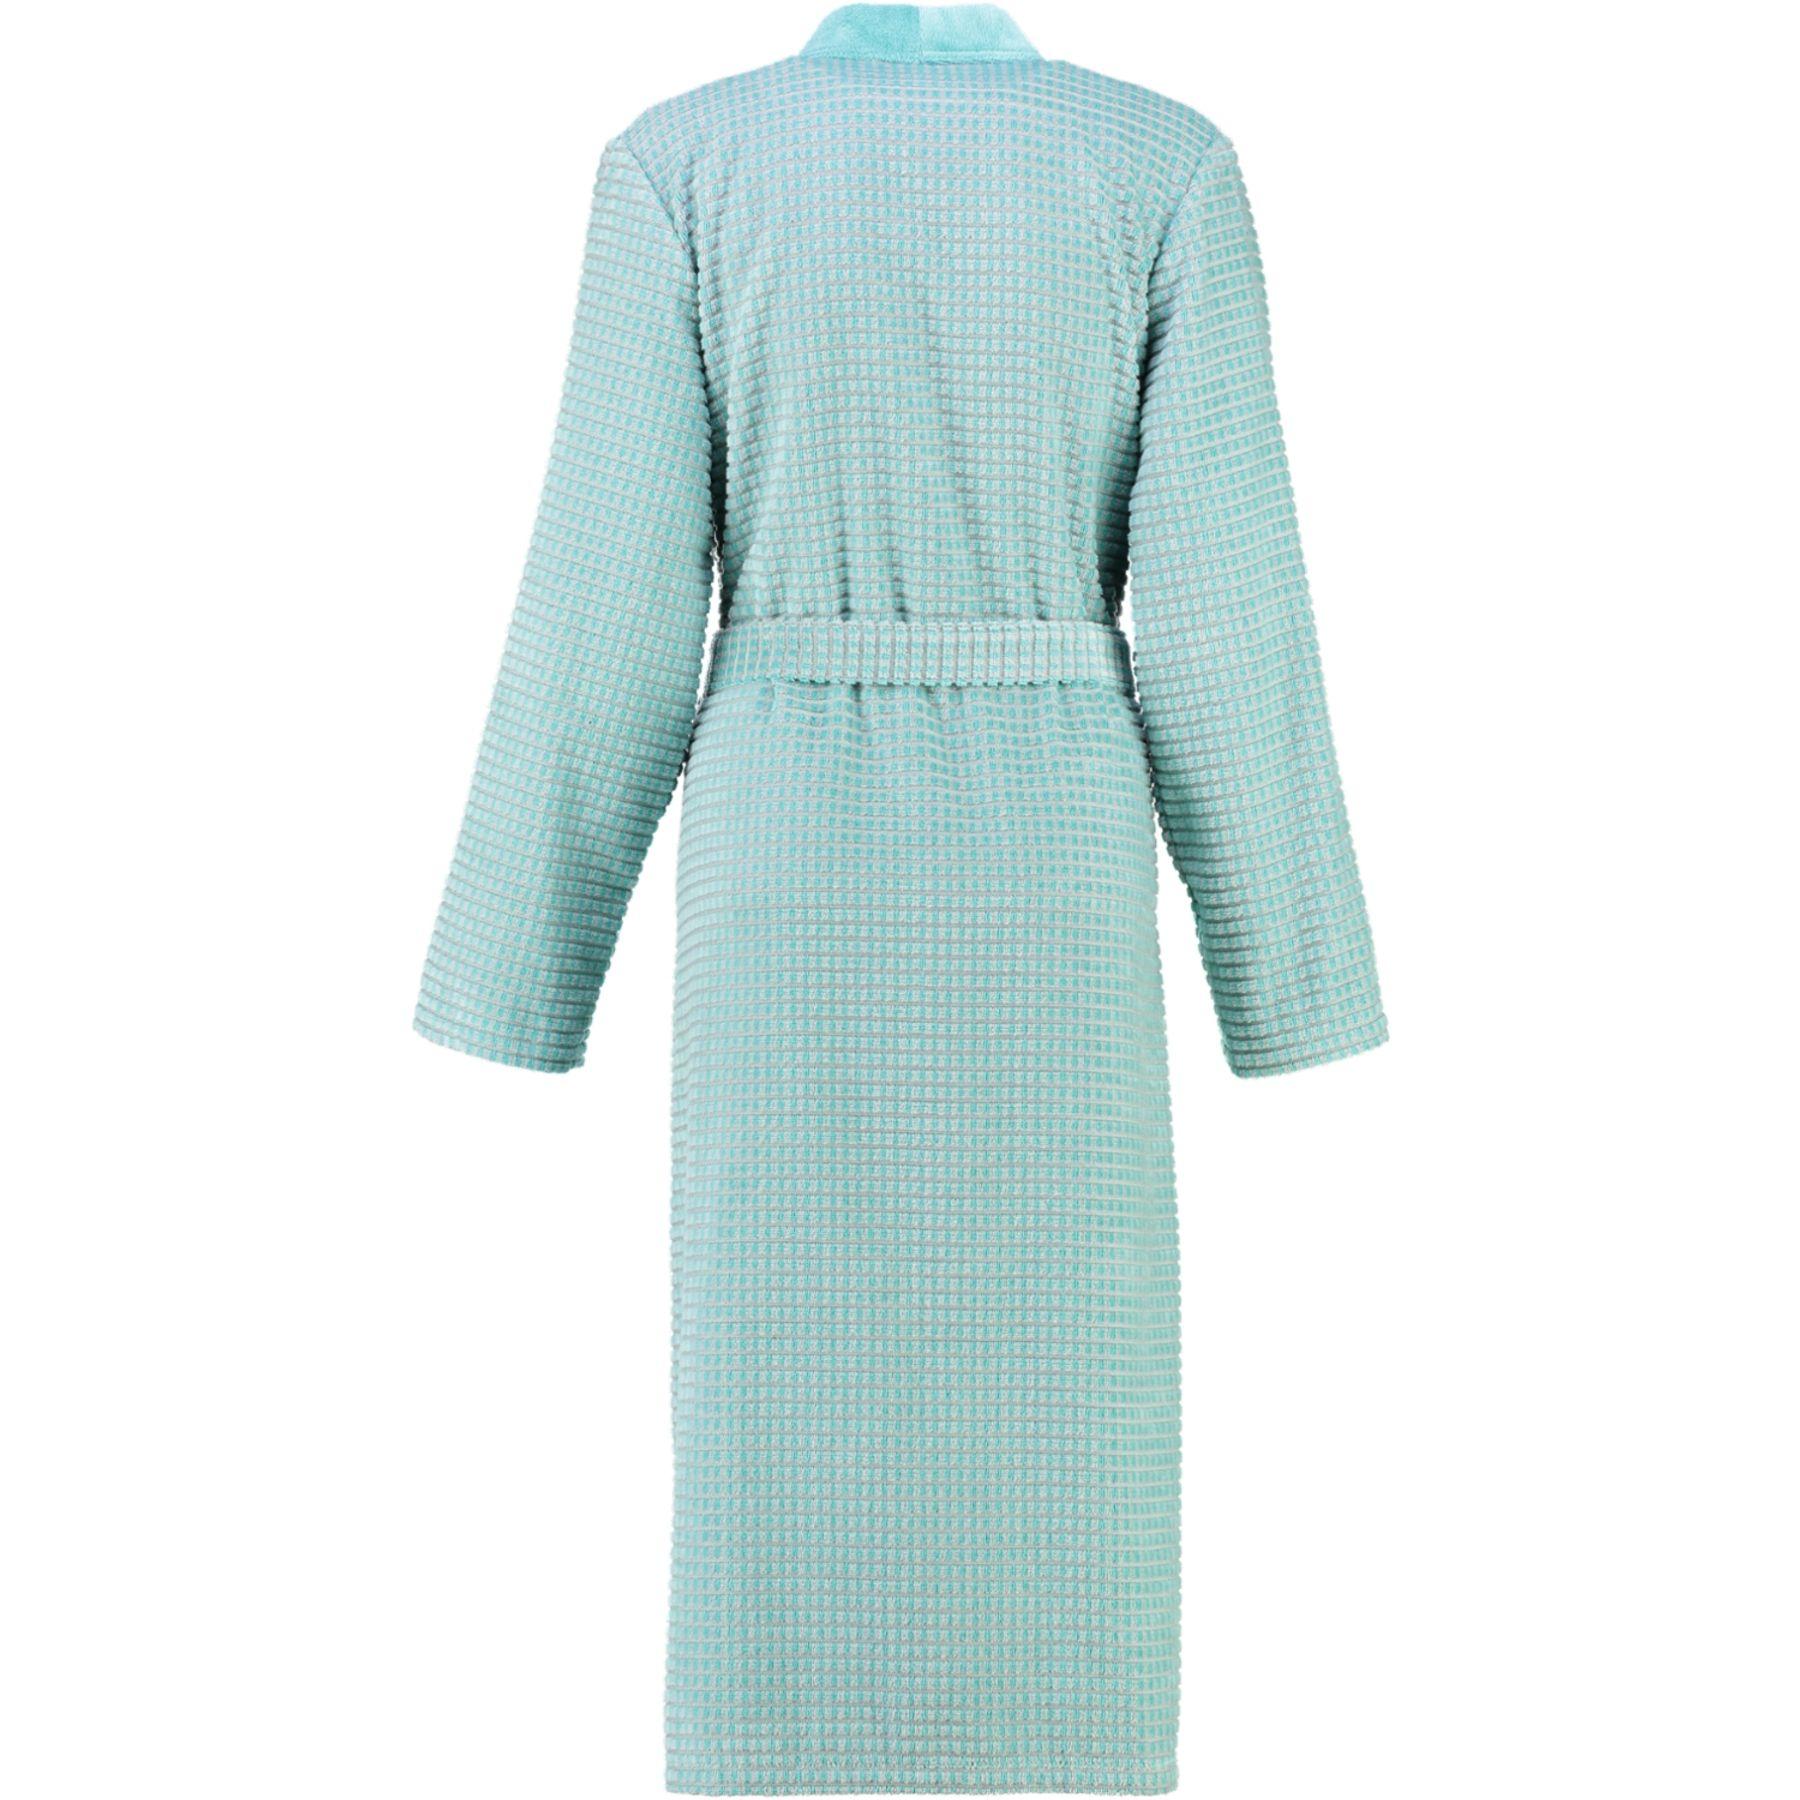 Cawö - Damen Walkvelours-Bademantel in Kimono-Form (4346) – Bild 5